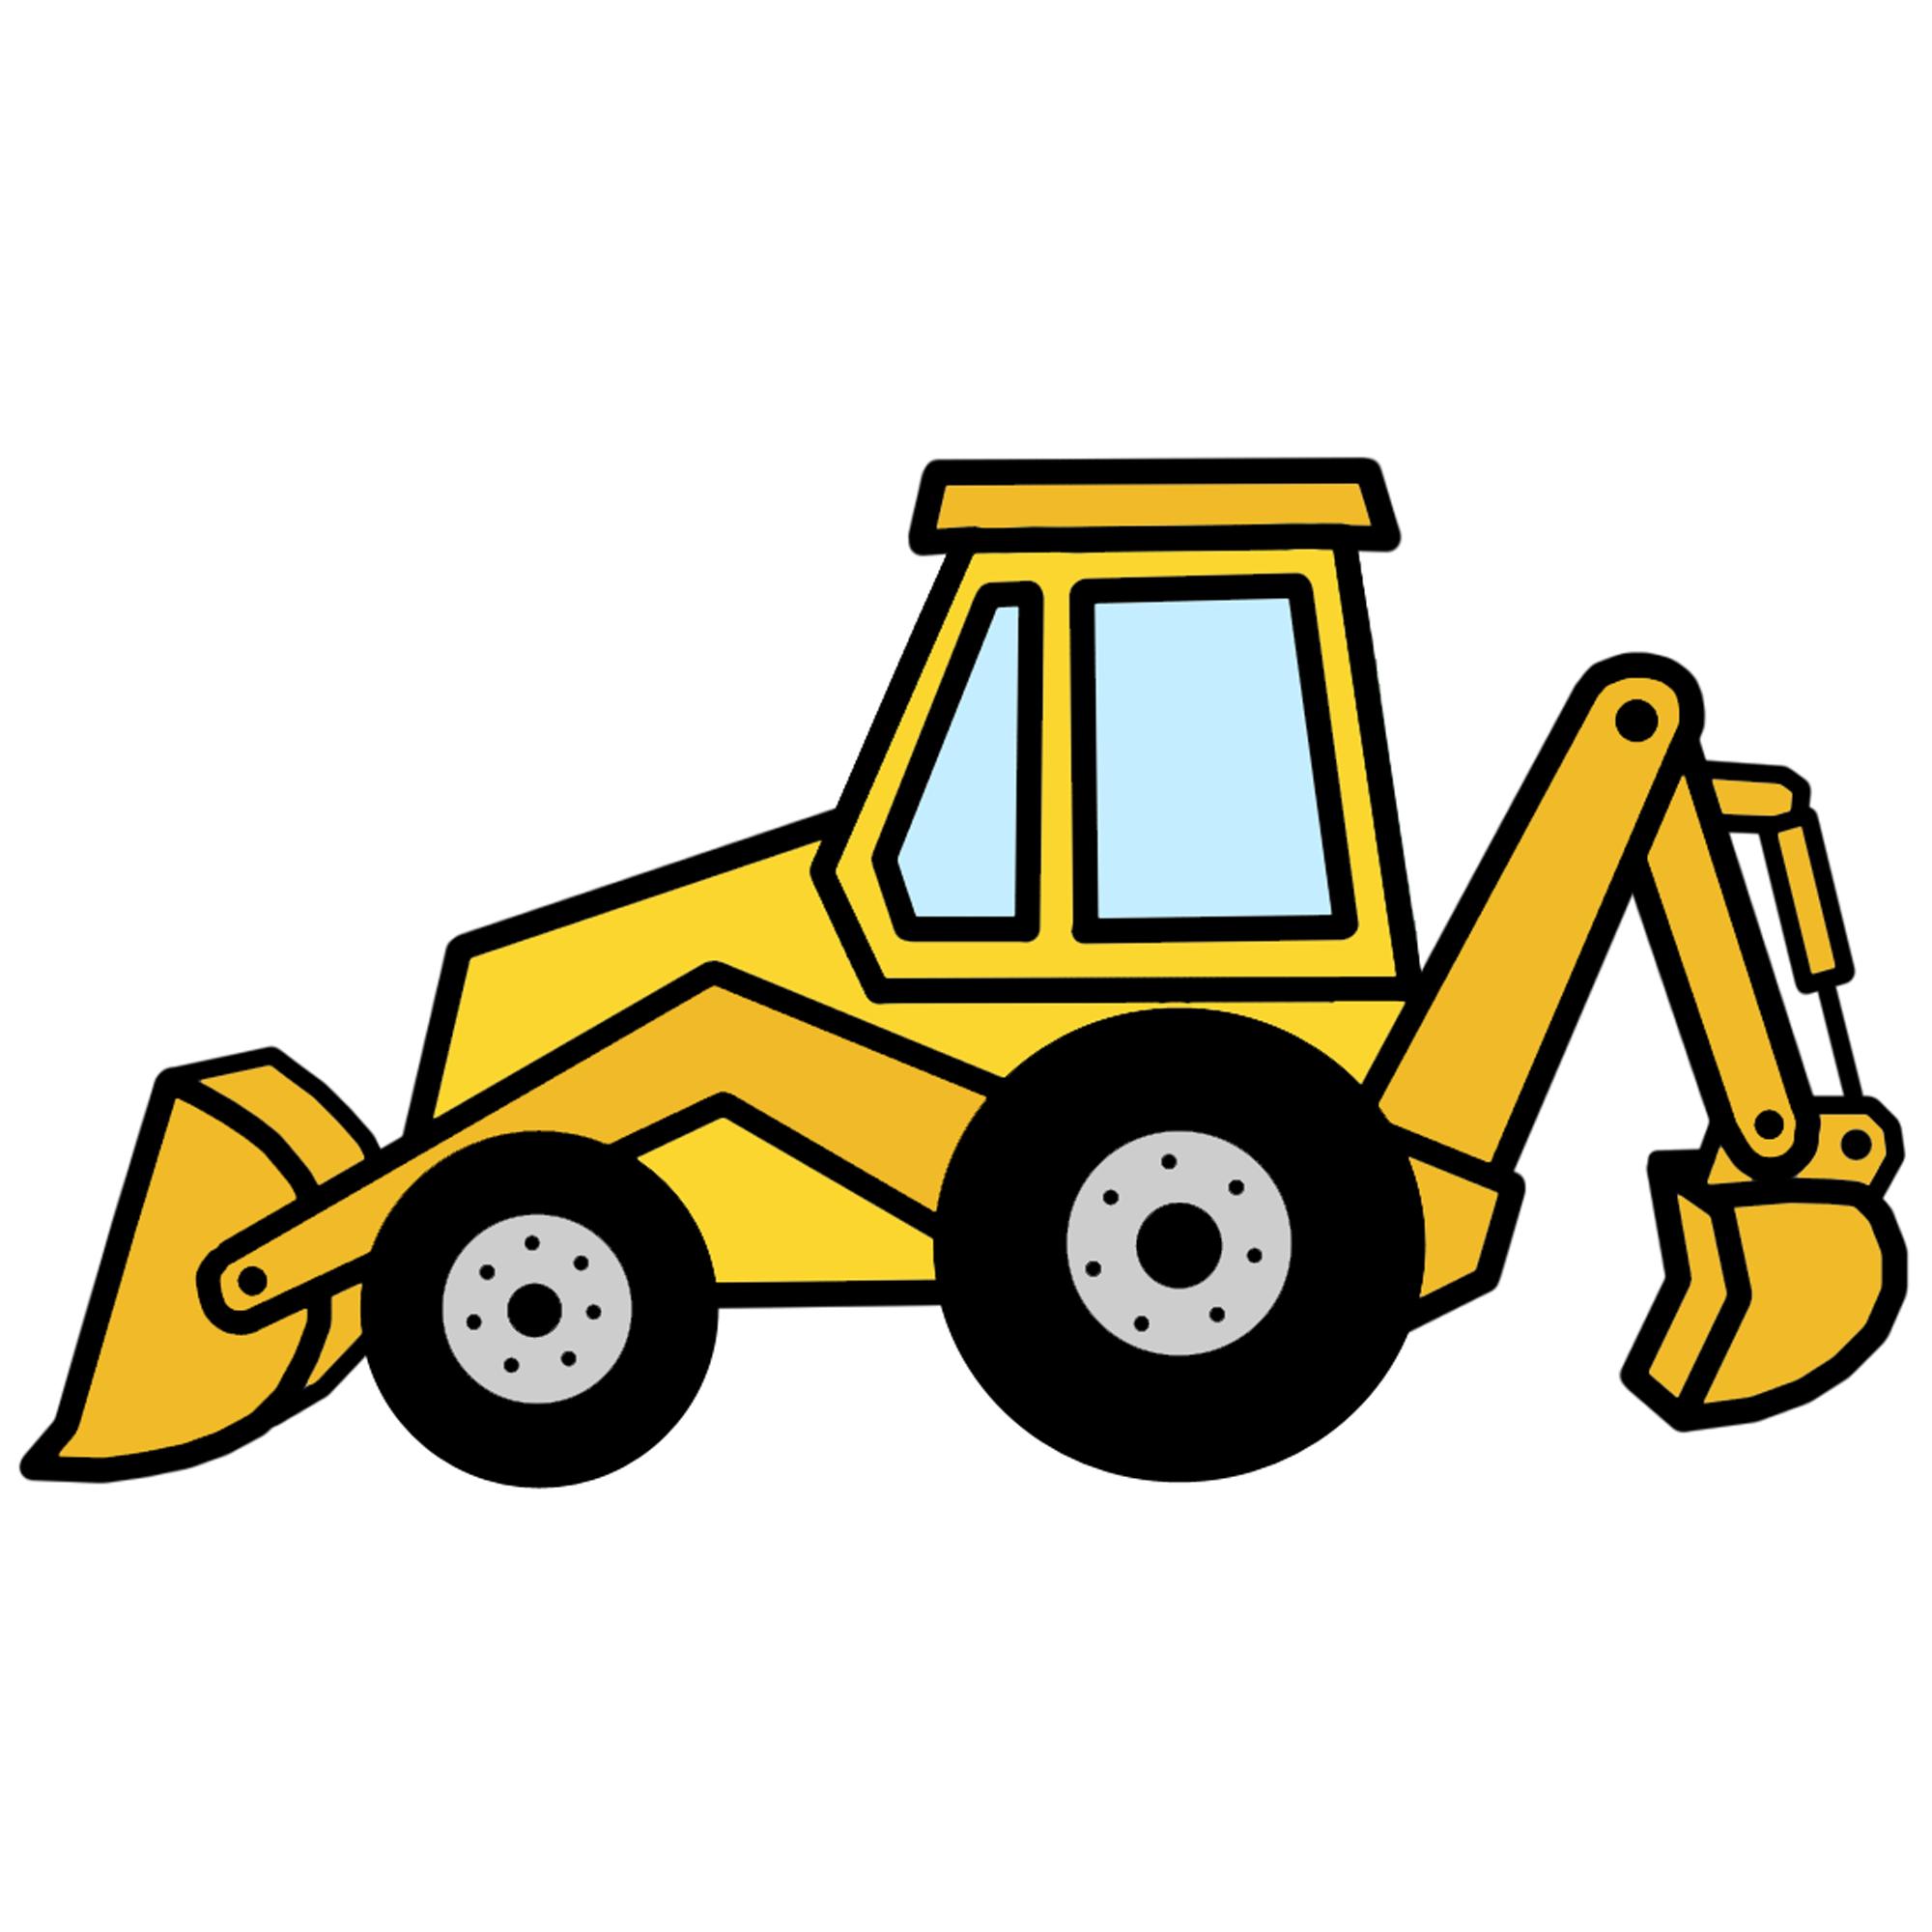 Tractor Front Grill Clip Art : John deere tractor clipart free download best